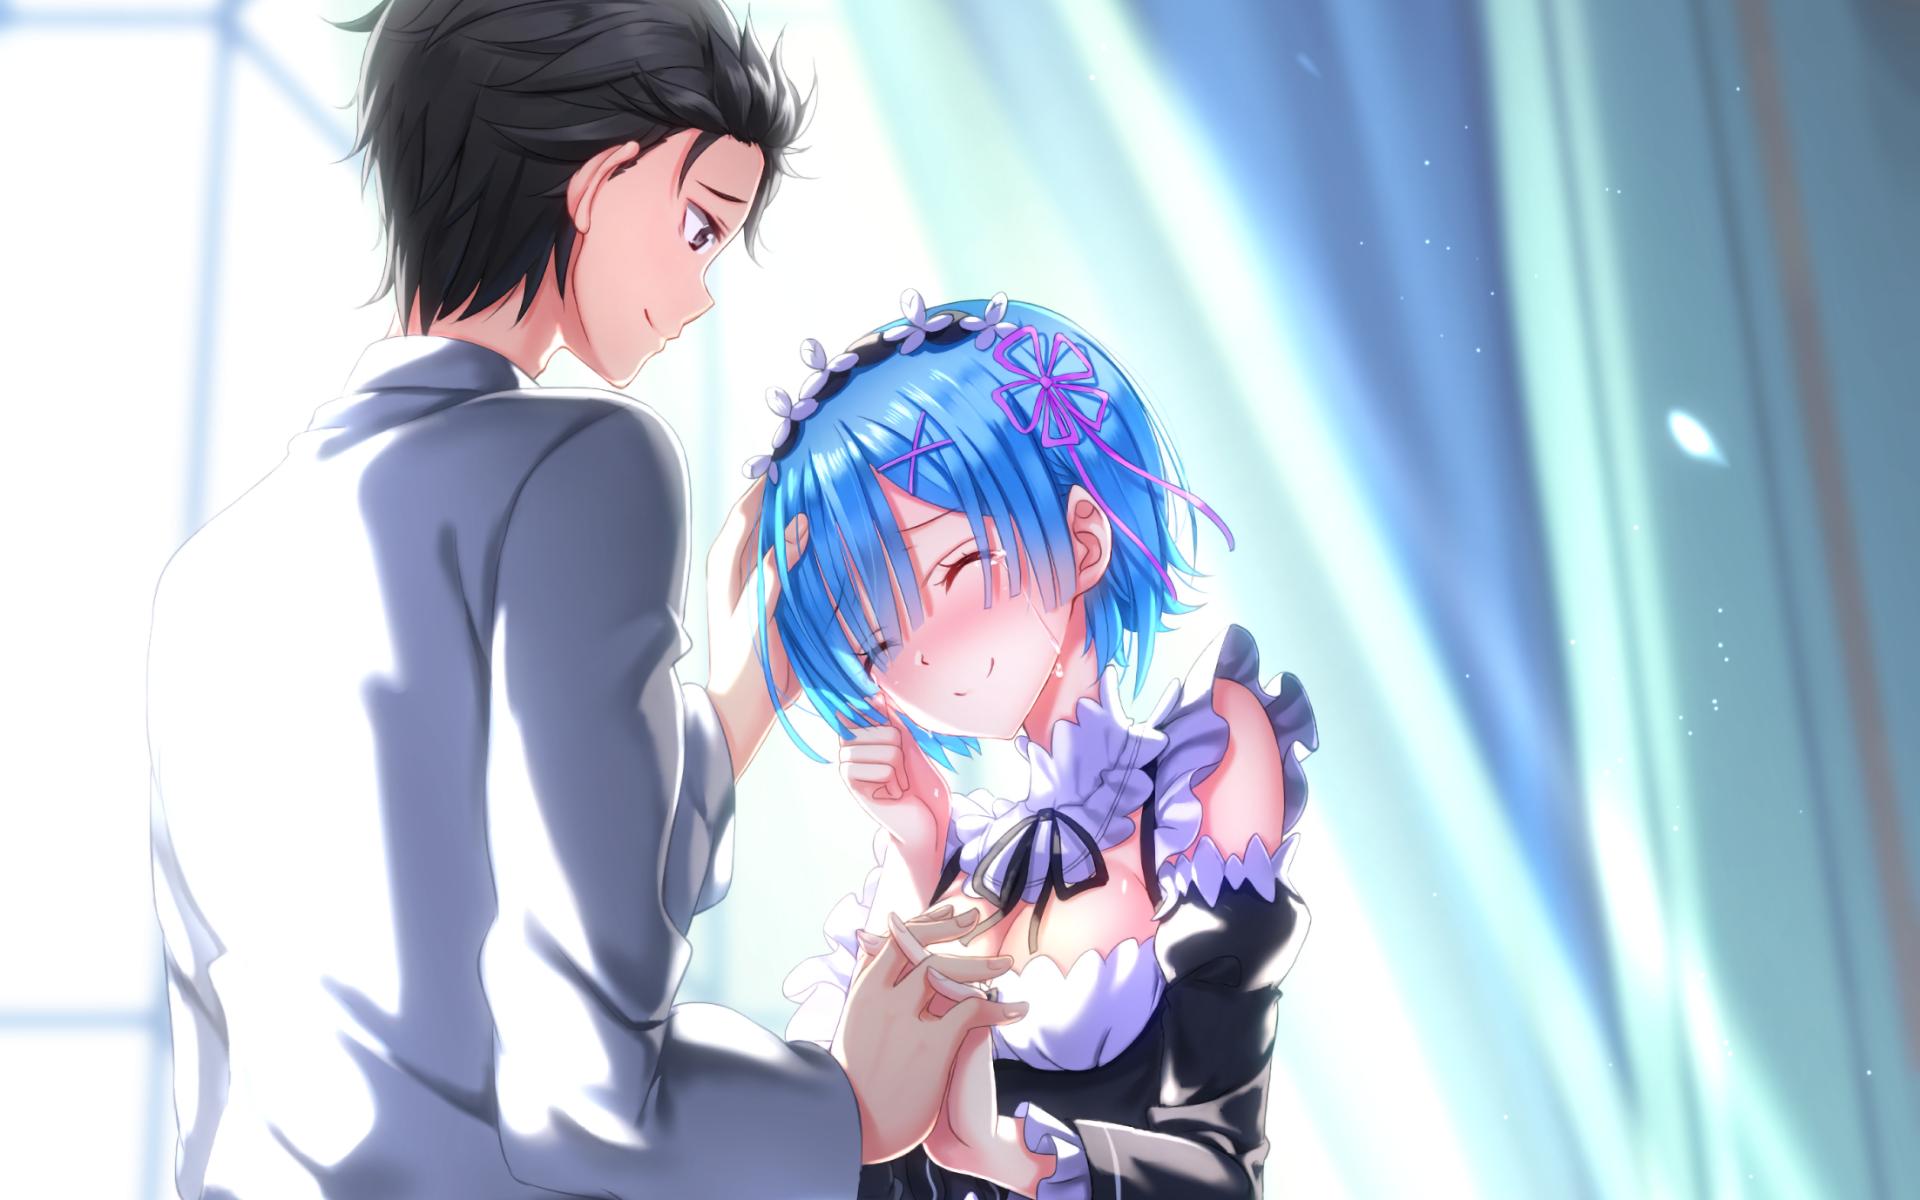 Anime Re Zero Starting Life In Another World Rem Re Zero Subaru Natsuki Re Zero Wallpaper Anime Subaru Rem